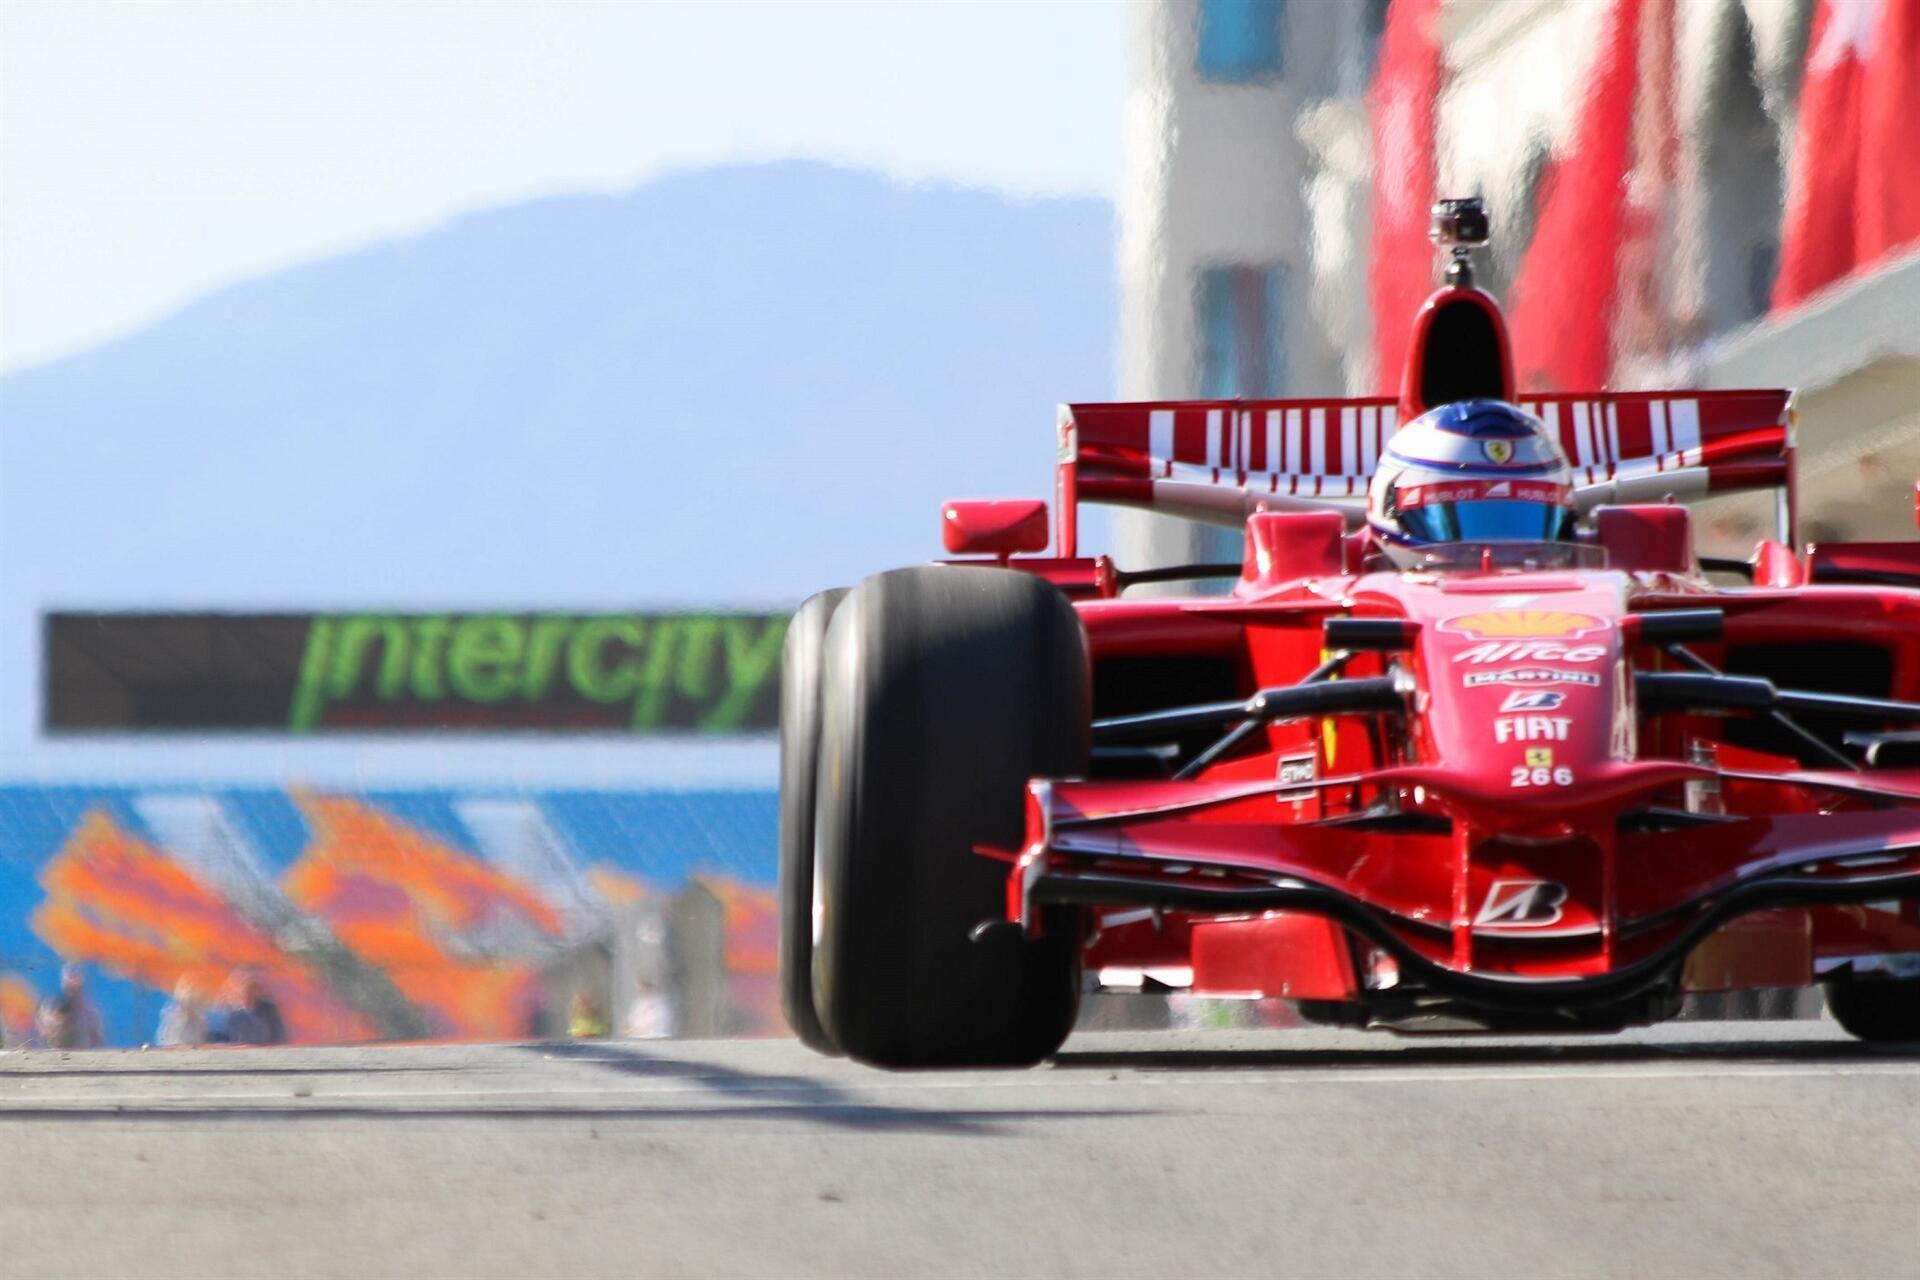 Turkey S Istanbul Park To Host F1 Race In November Turkish News